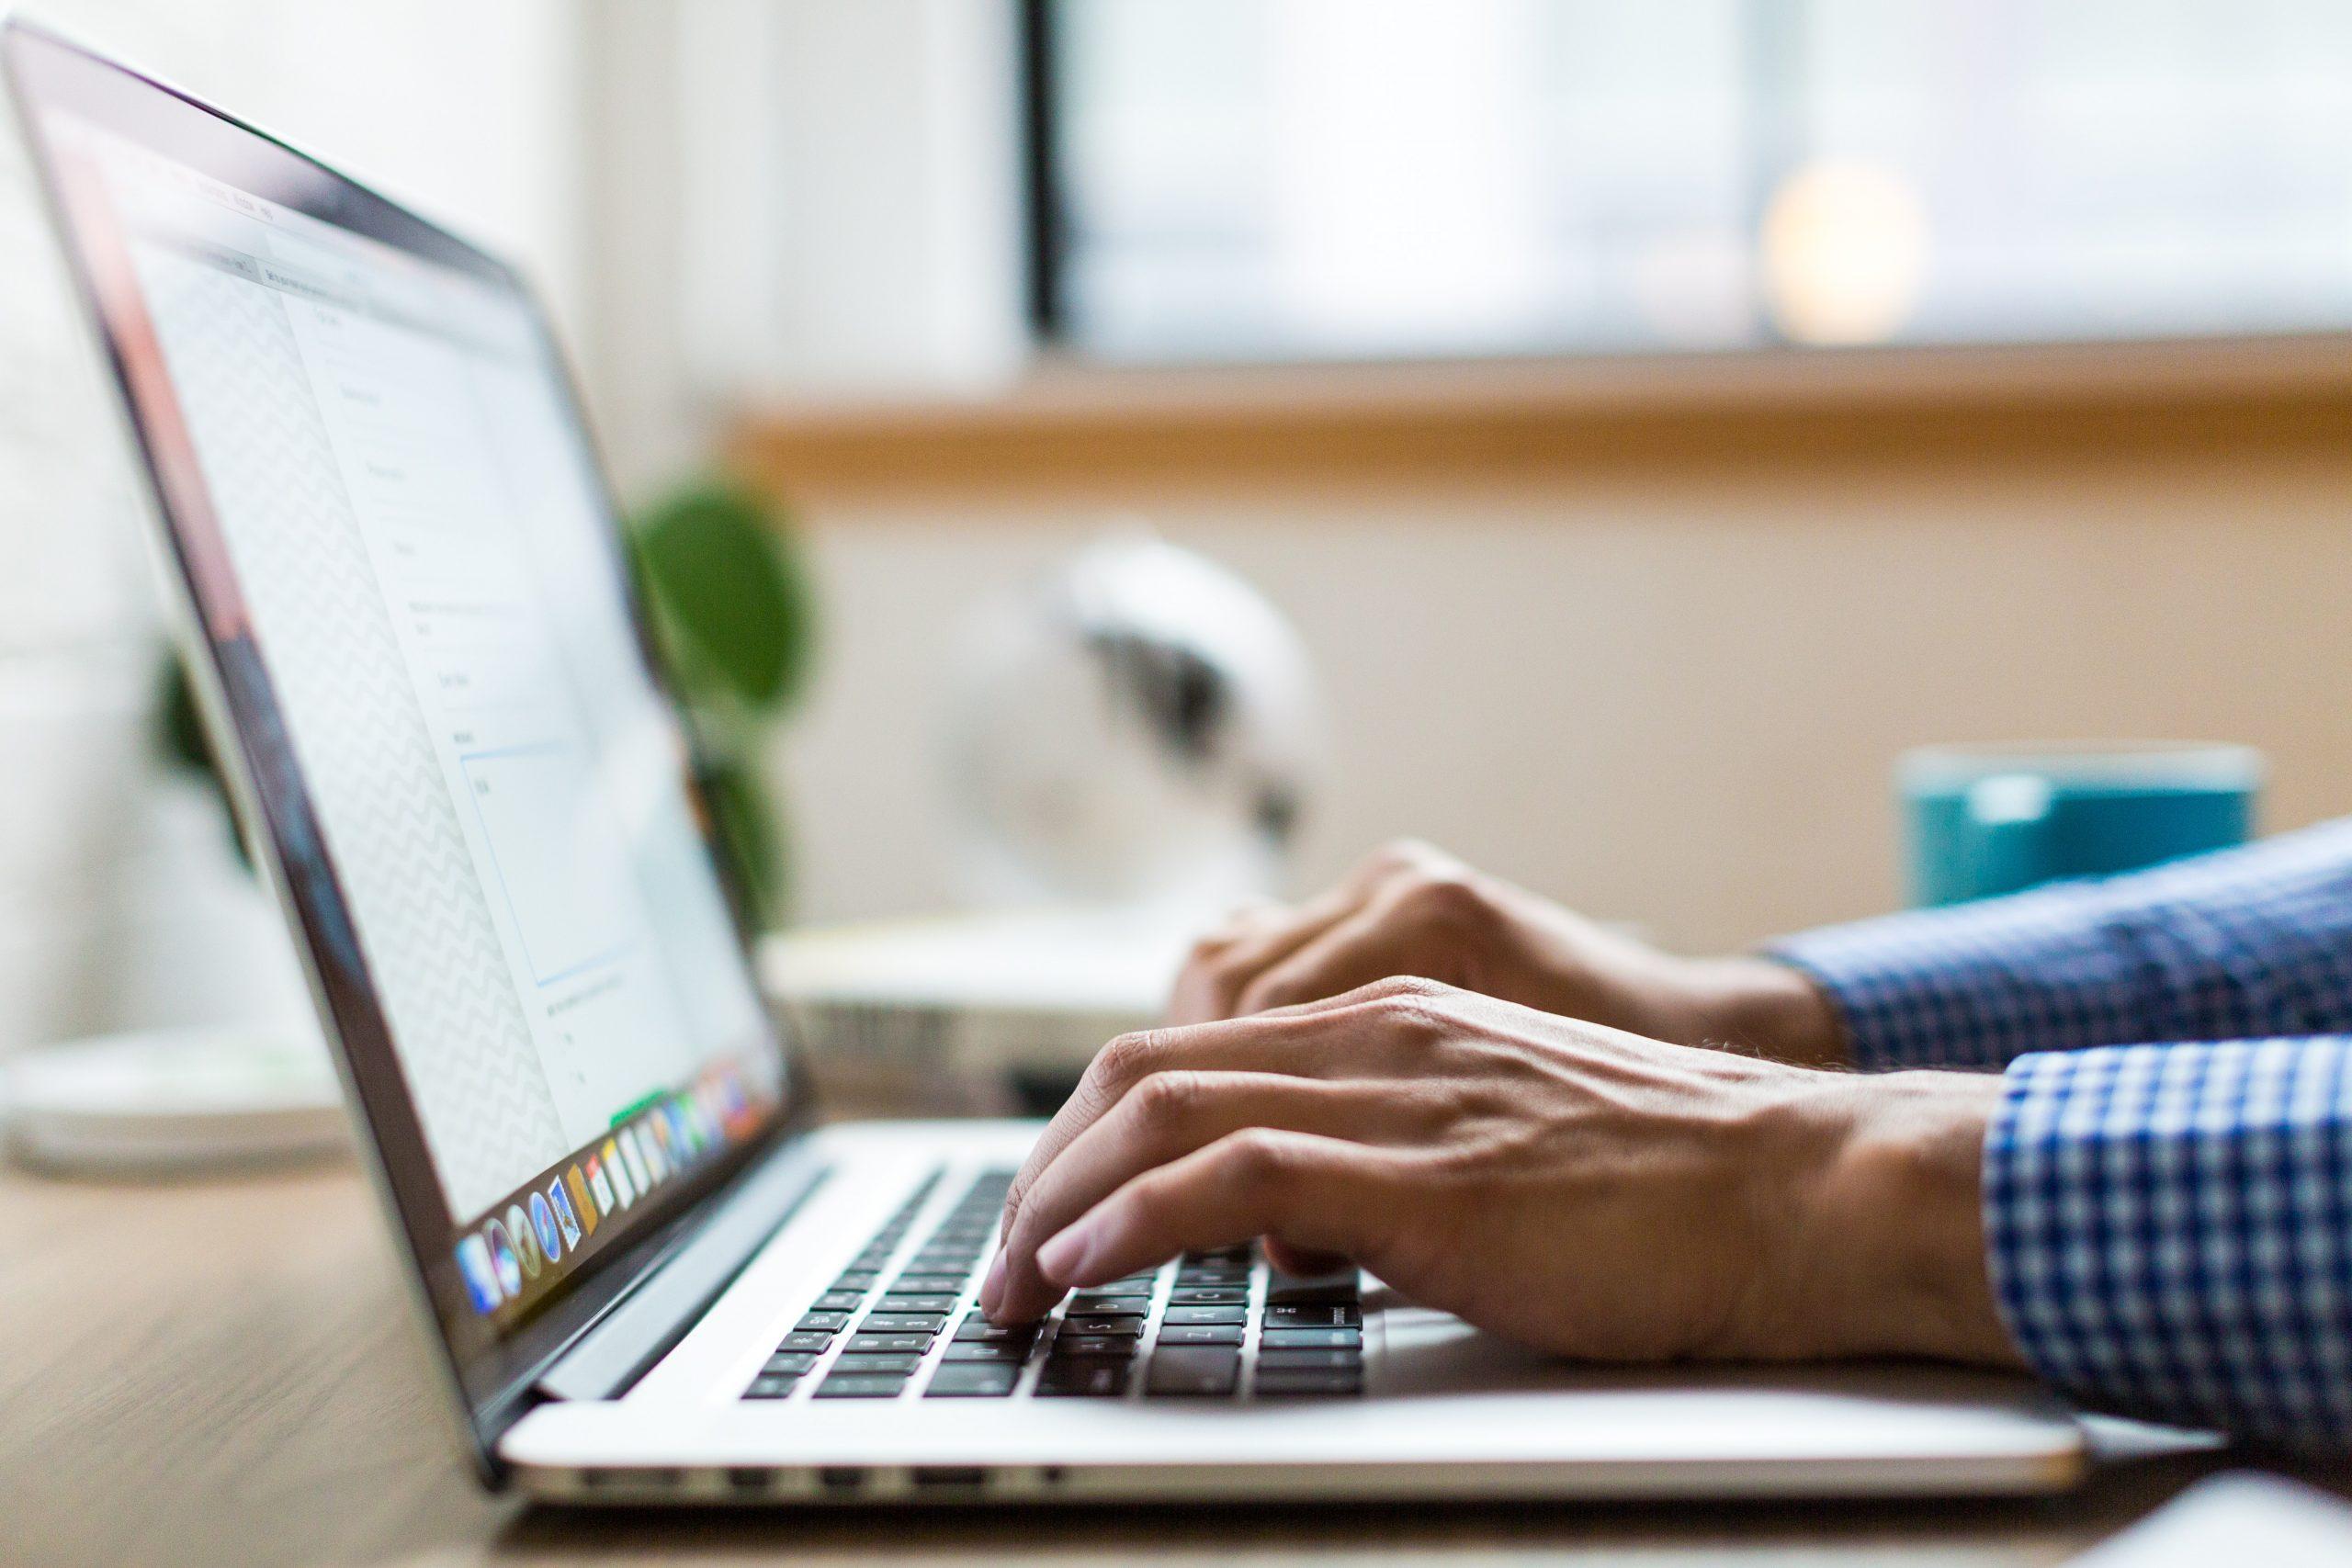 hands working on computer